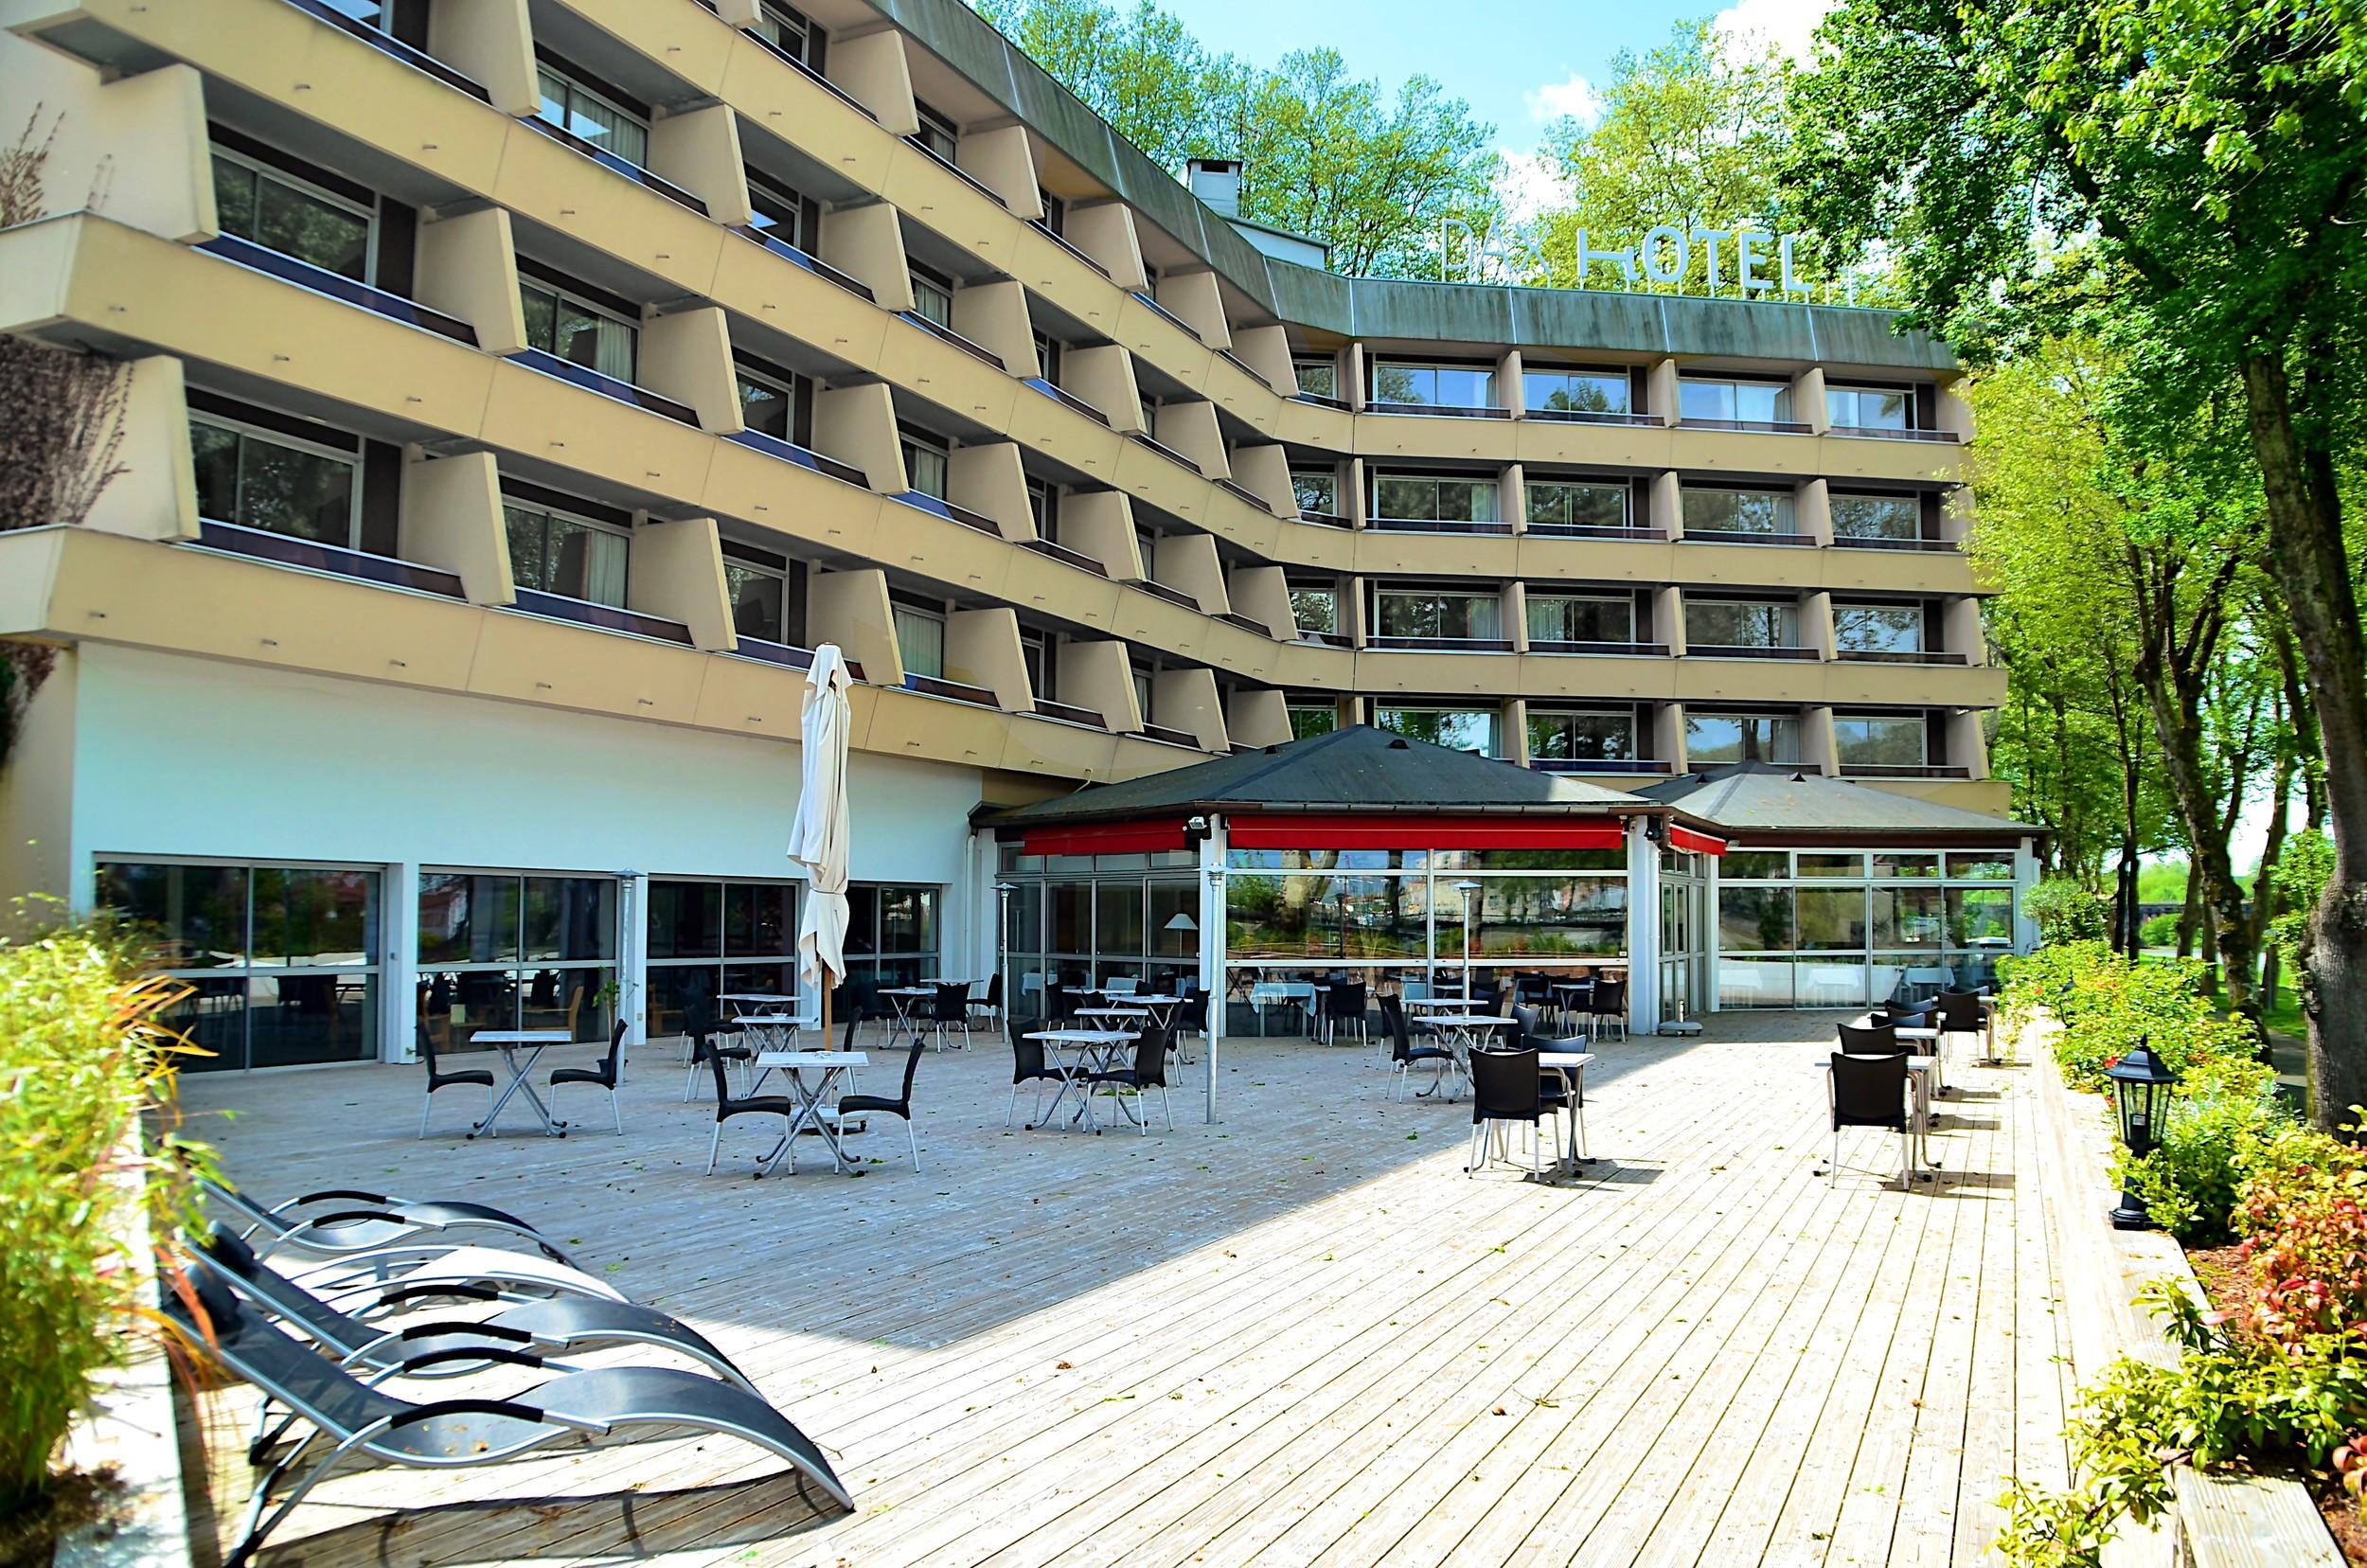 Dax Hotel - Terrasse 1.jpg